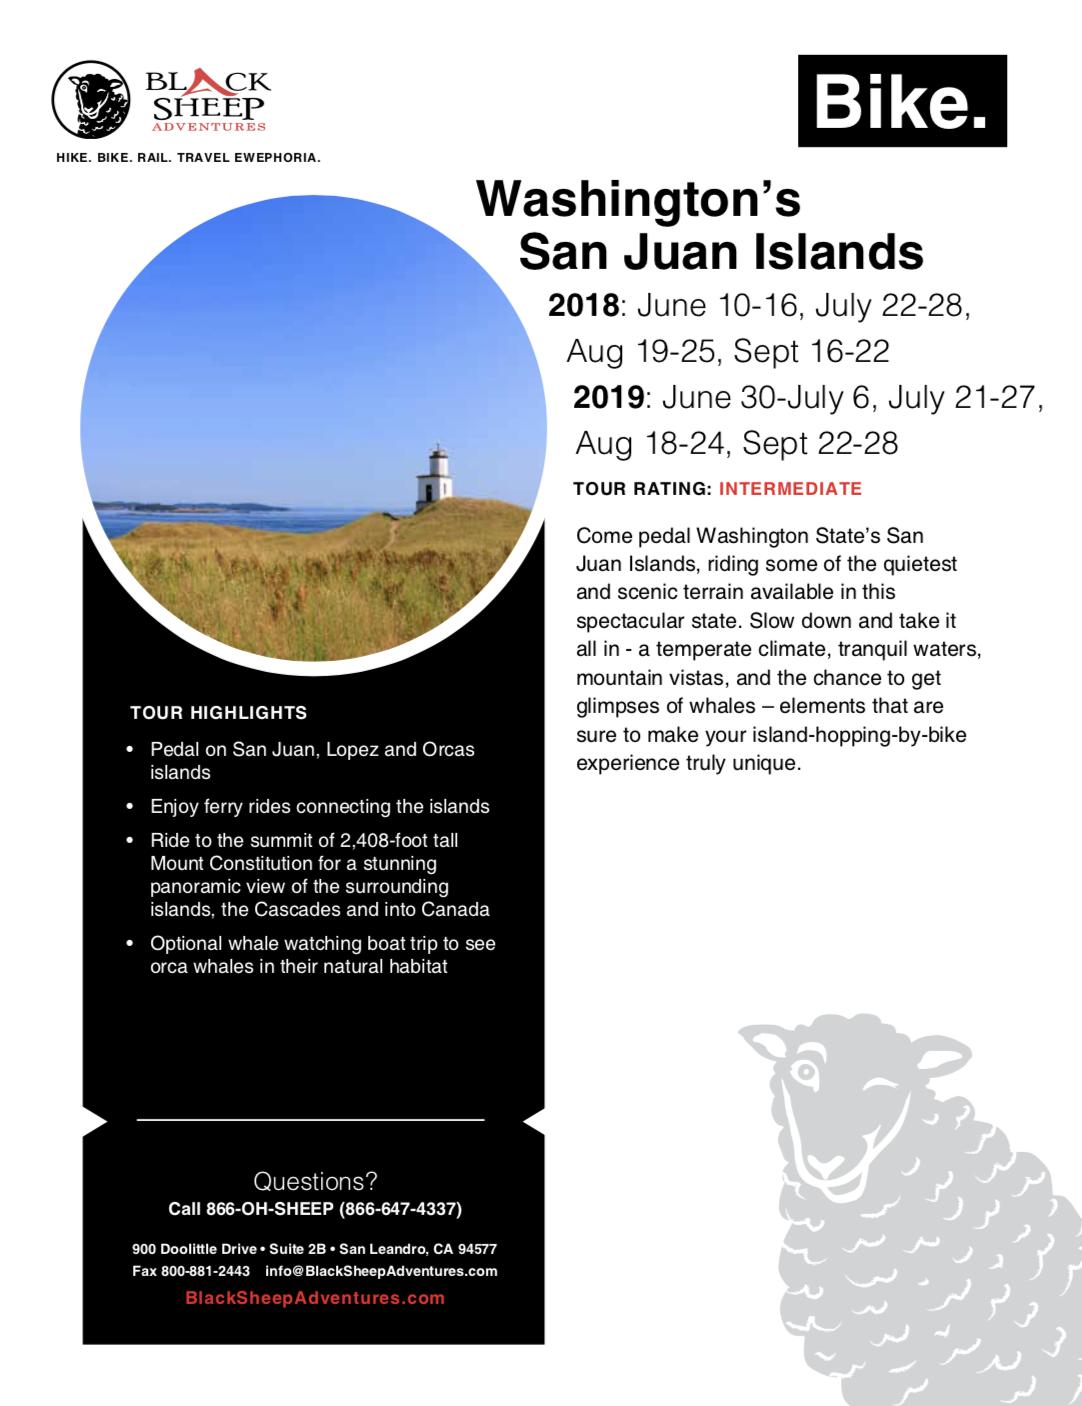 Washington's San Juan Islands Bike Tour - Black Sheep Adventures